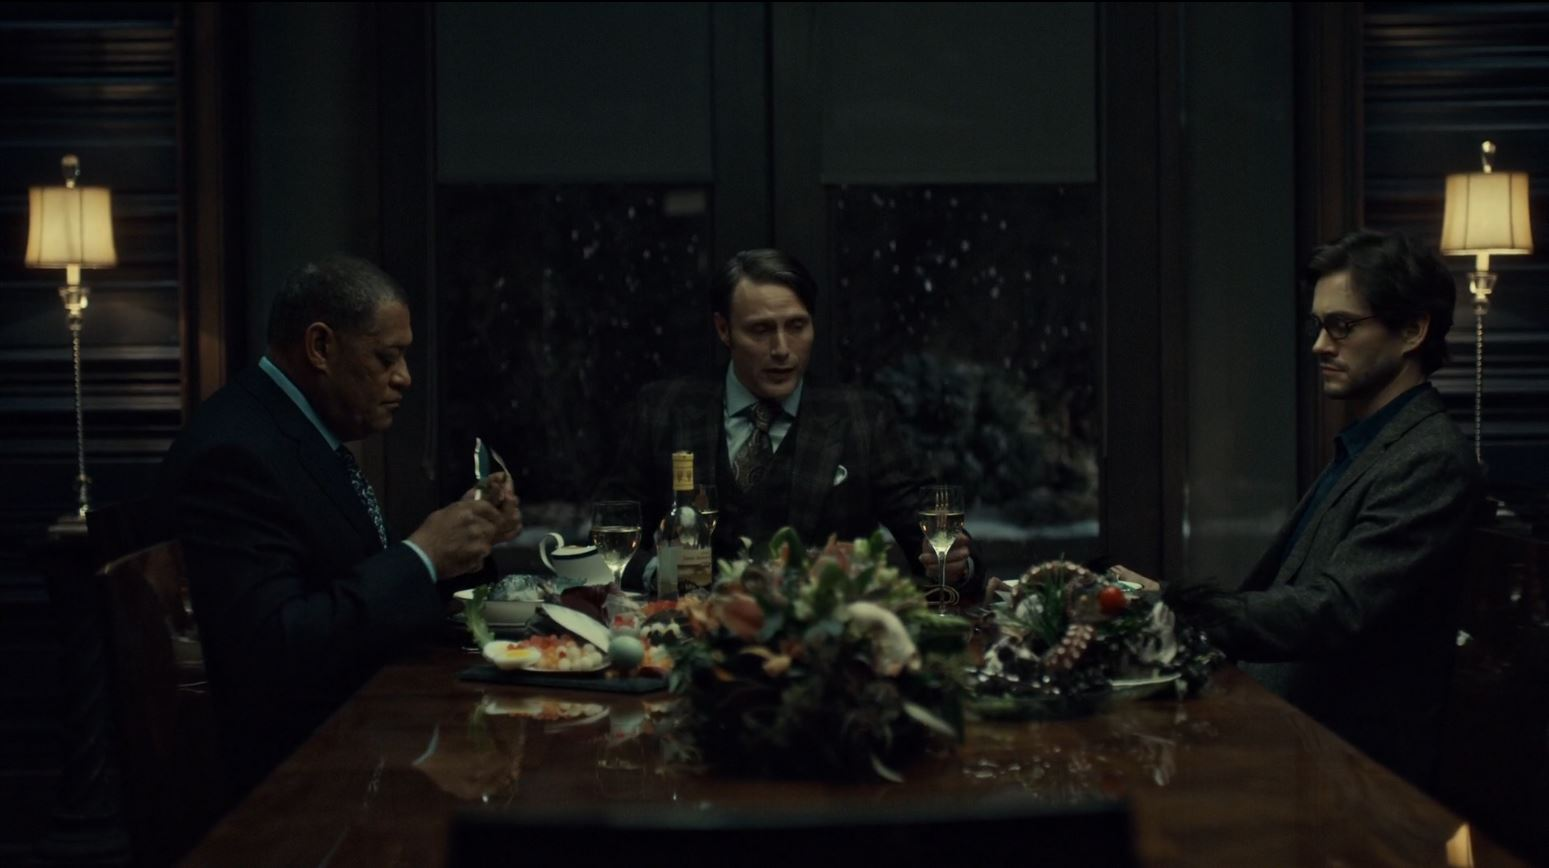 Hannibal Season 2 Episode 8 Su-zakana - Hannibal, Crawford and Graham eating fish